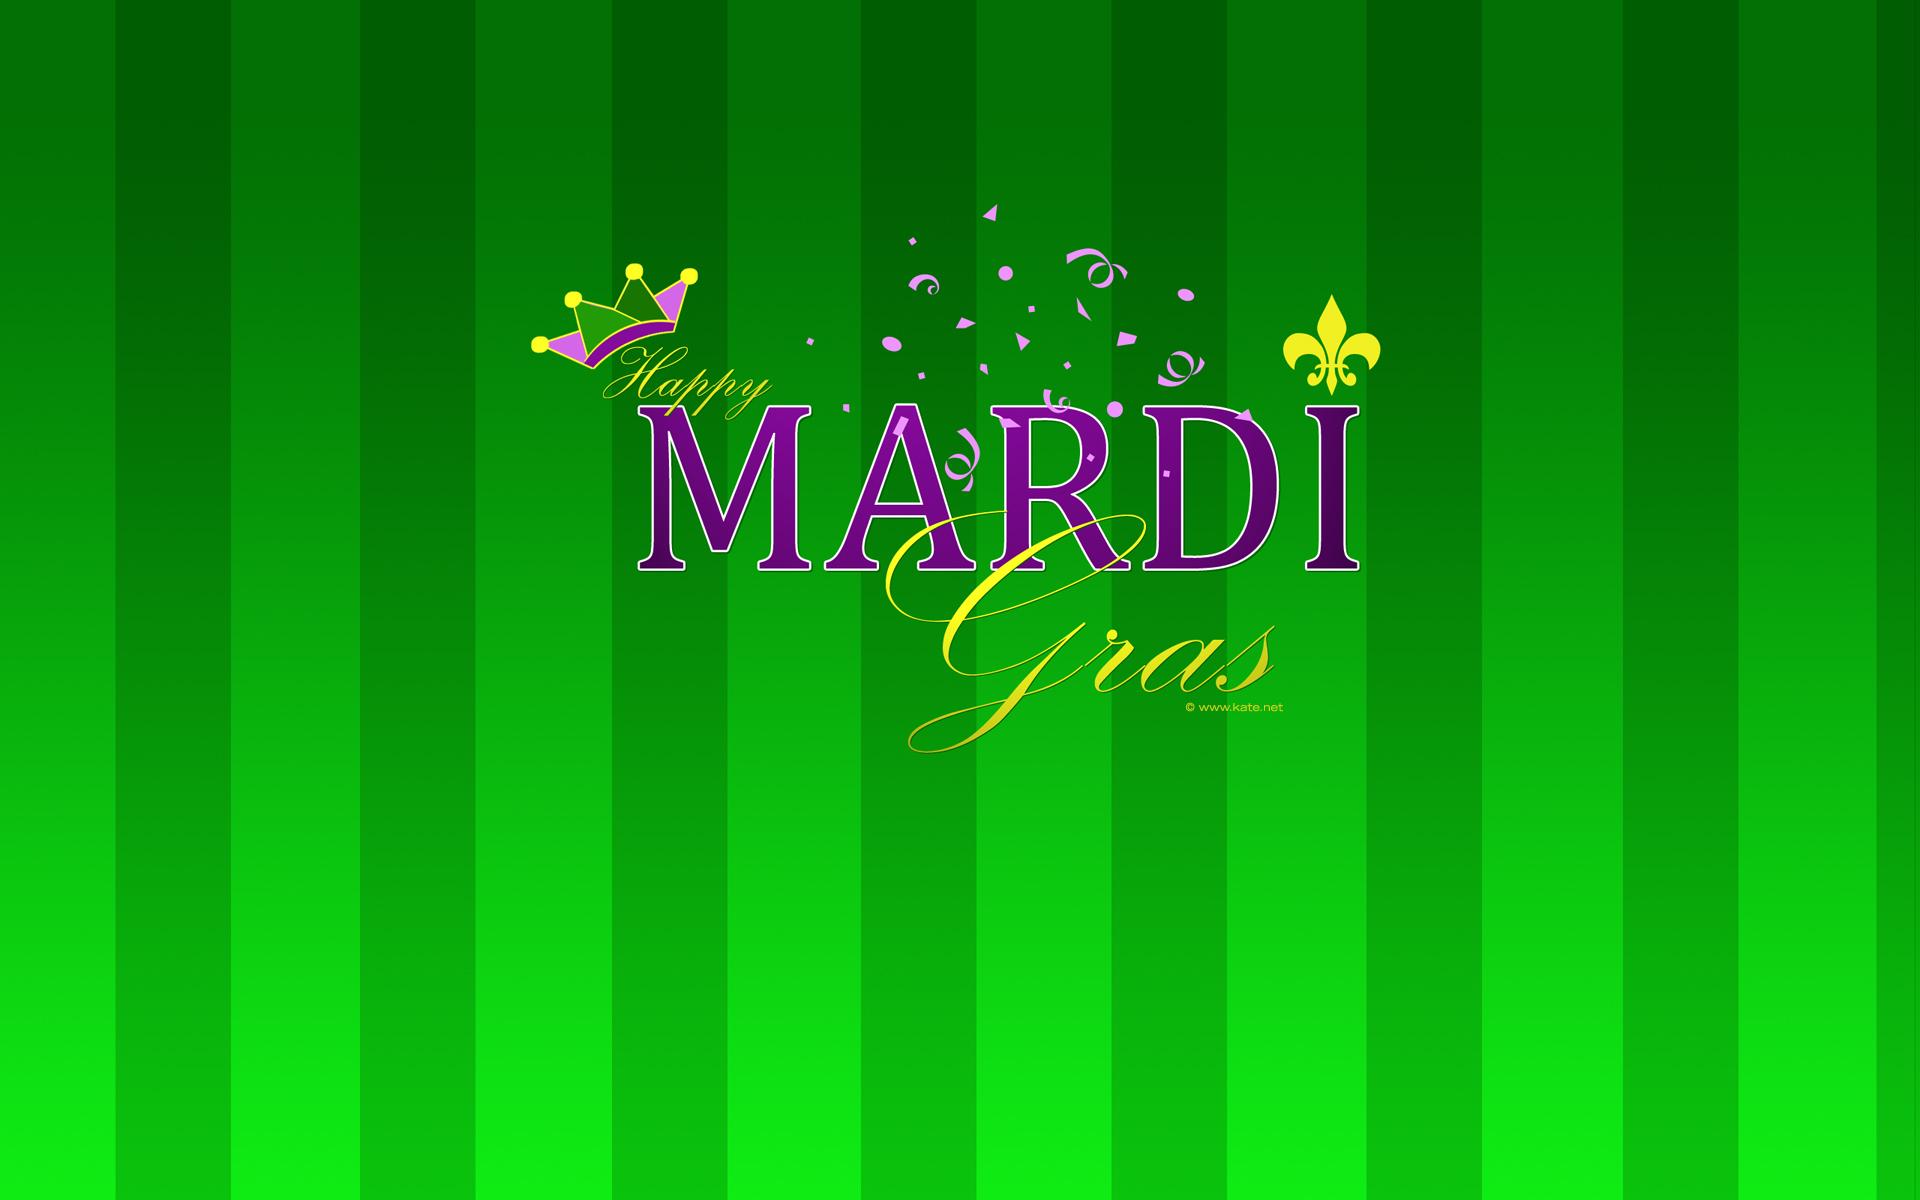 Mardi Gras Wallpapers Mardi Gras Backgrounds by Katenet 1920x1200